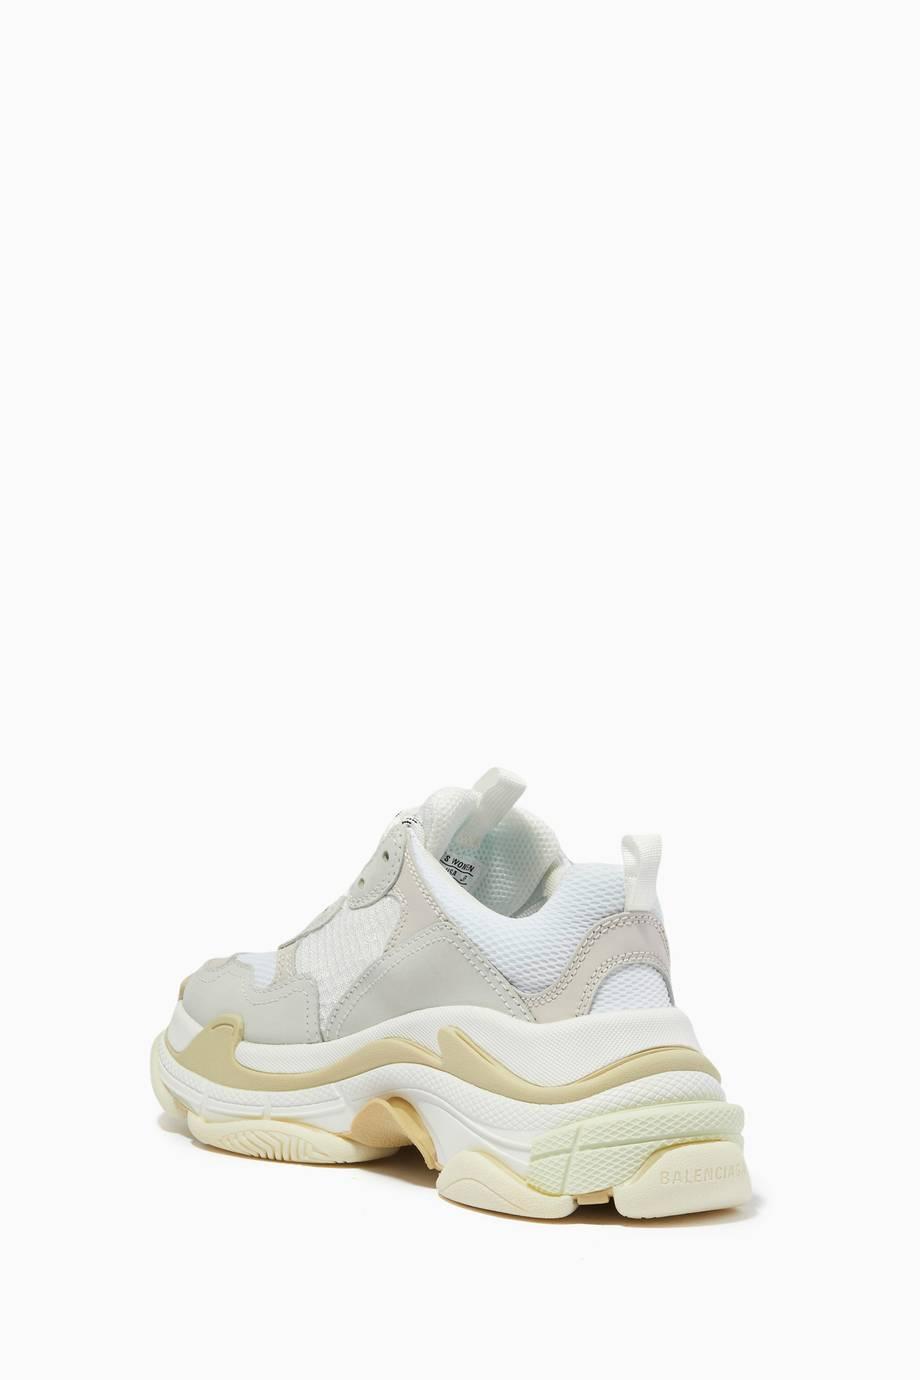 Shop Luxury Balenciaga White Triple S Sneakers